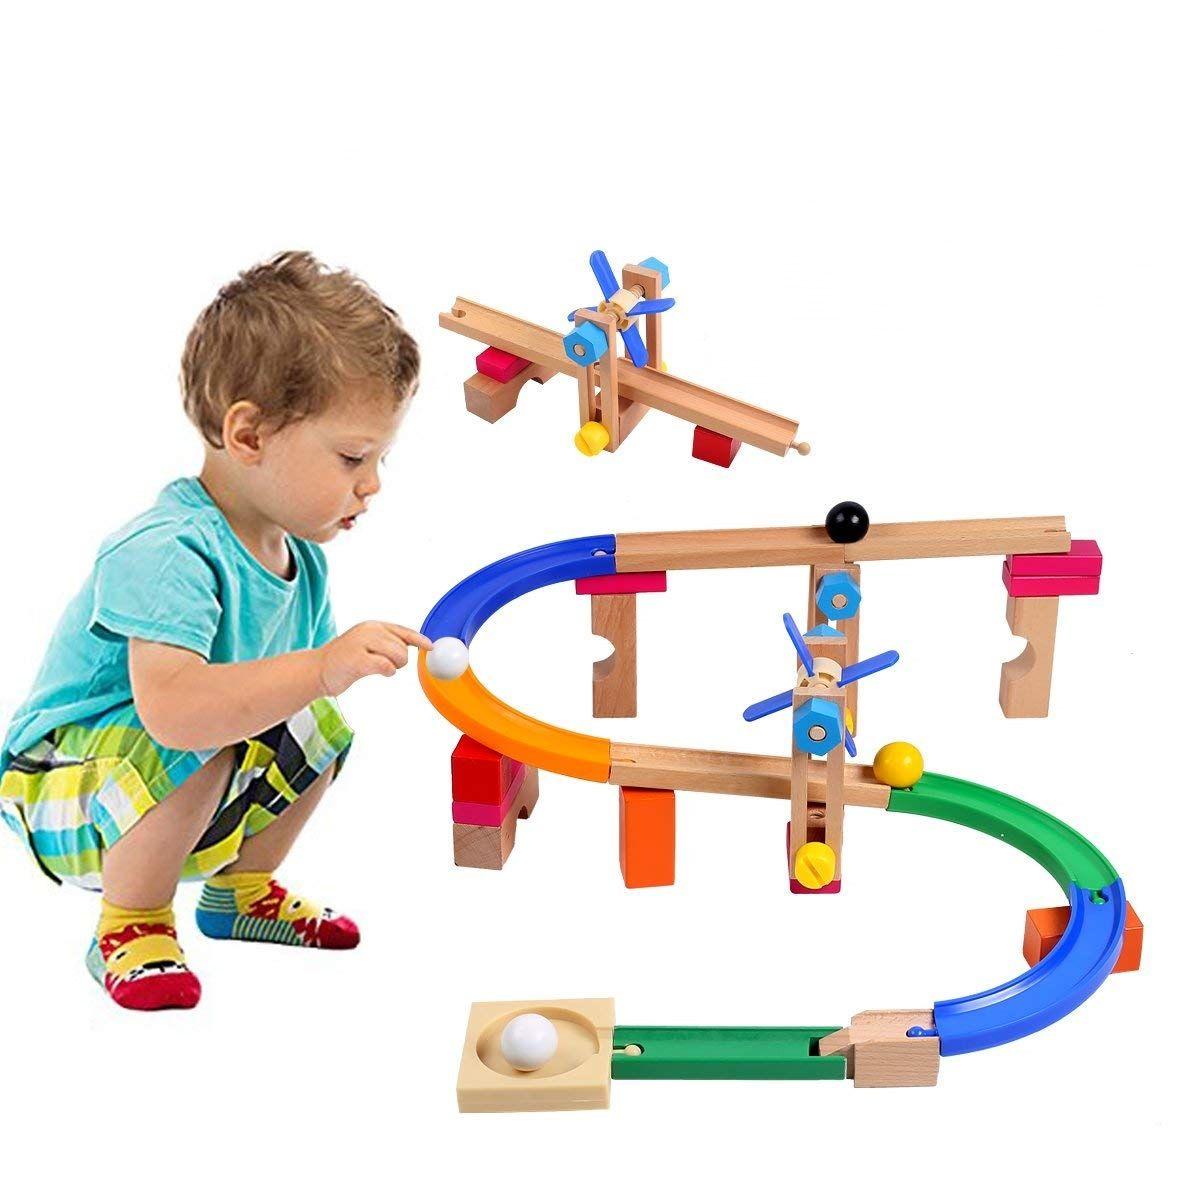 Marble Run Roller Coaster Track Blocks Kids Children Educational Construction Building Wooden Toys